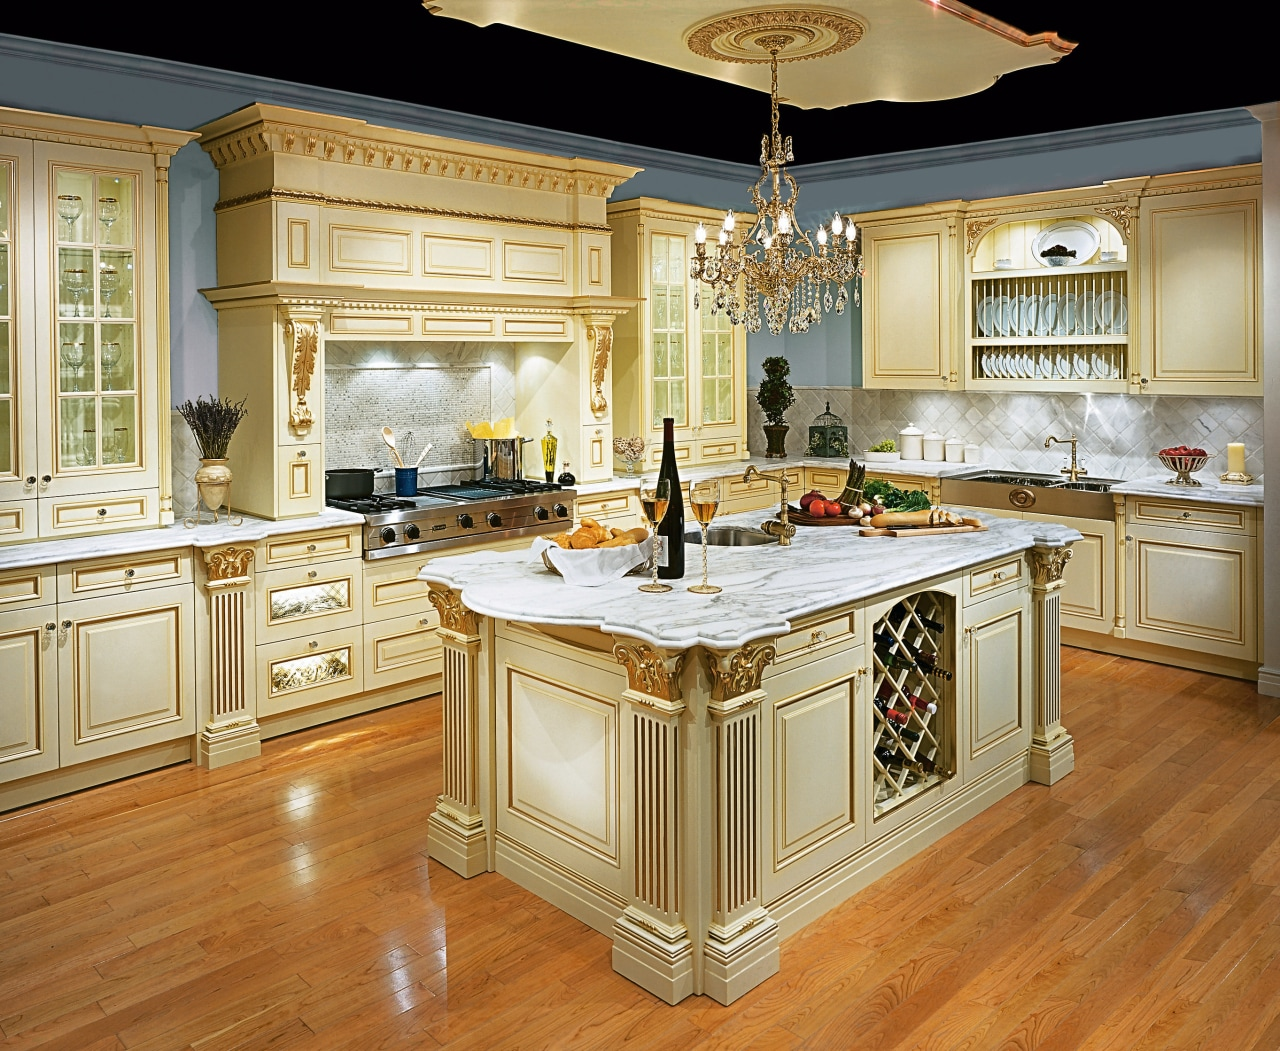 view of this victorian designed kitchen showing timber cabinetry, countertop, cuisine classique, floor, flooring, hardwood, interior design, kitchen, room, wood flooring, brown